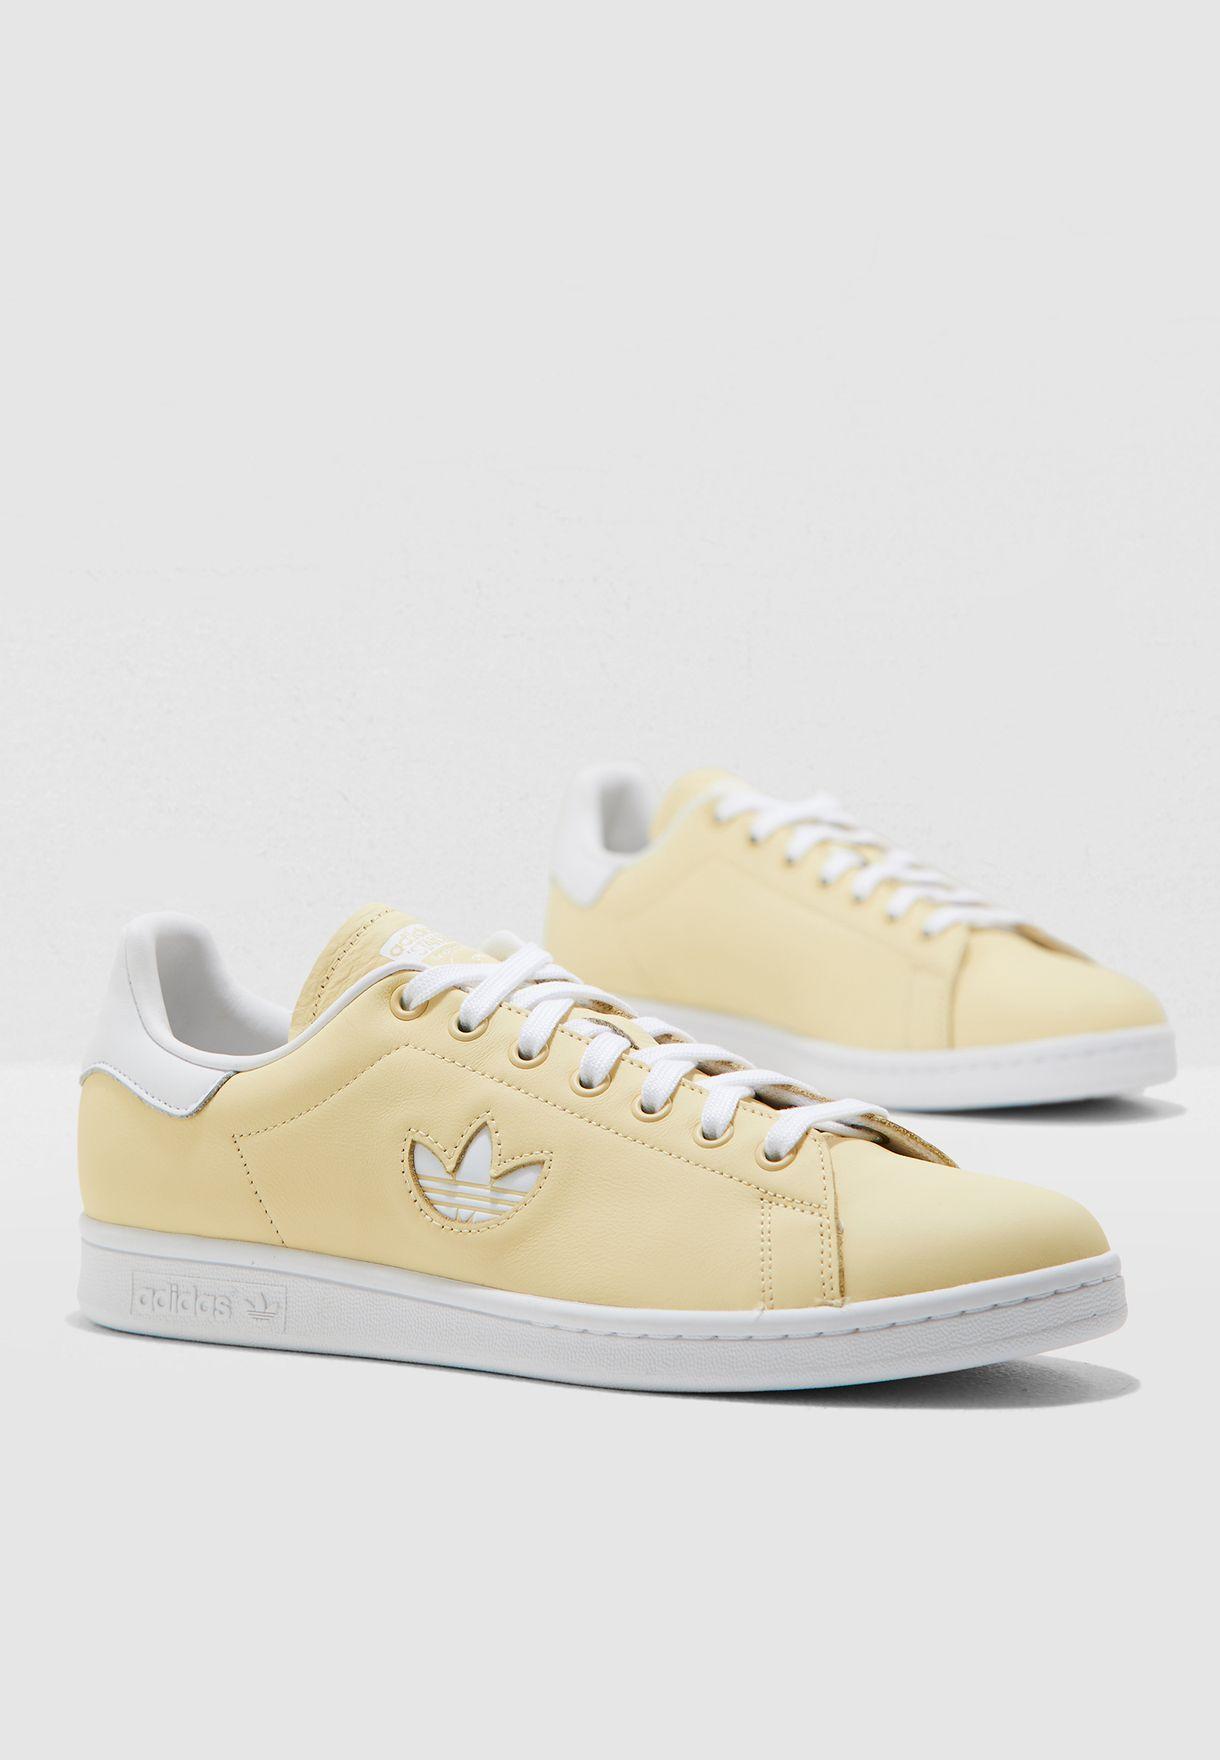 new style 8b9f4 fbf43 Shop adidas Originals yellow Stan Smith BD7438 for Men in Saudi -  14448SH56ZSP